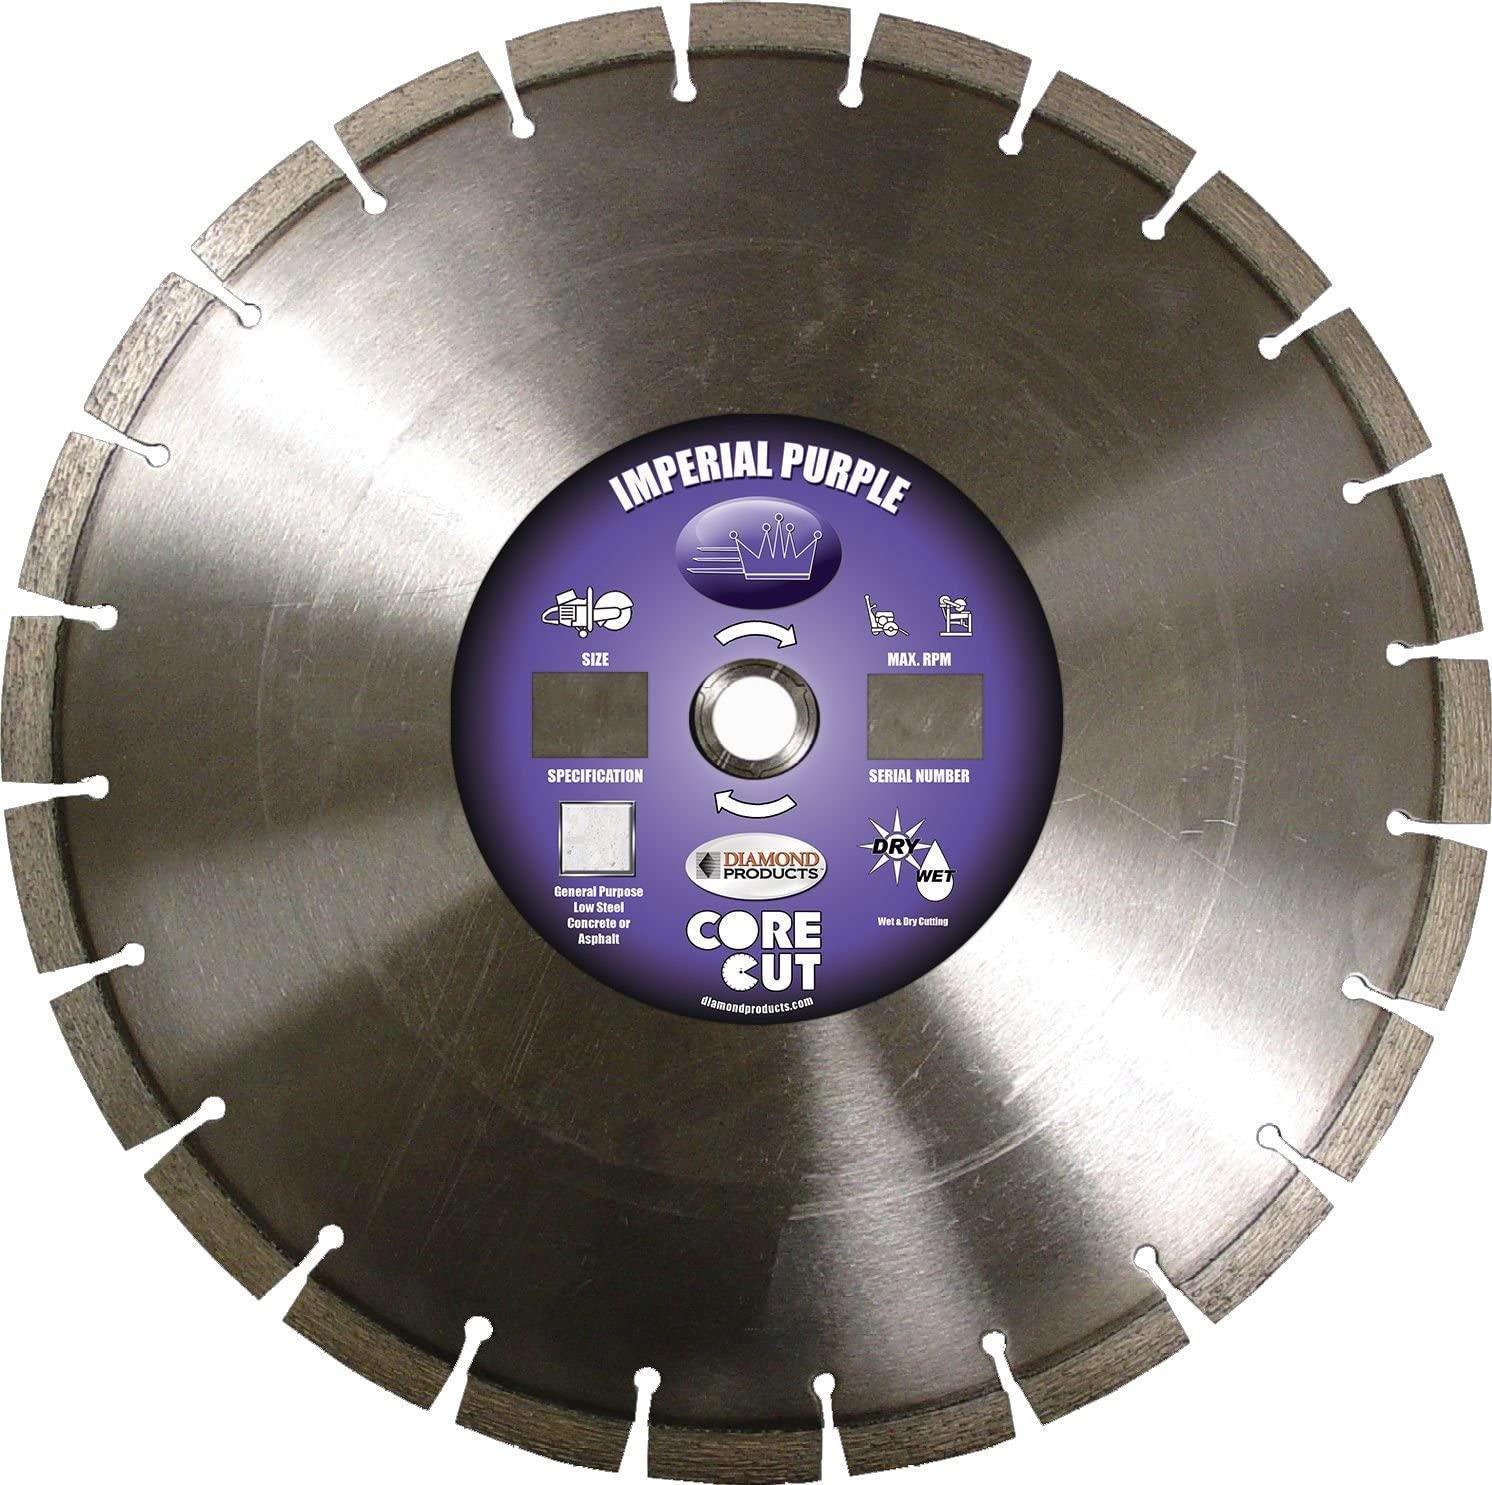 Diamond Products Core Cut Diamond Product 73080 Imperial Purple Segmented Dry Walk Behind Diamond Blade 14 x .125 x 1